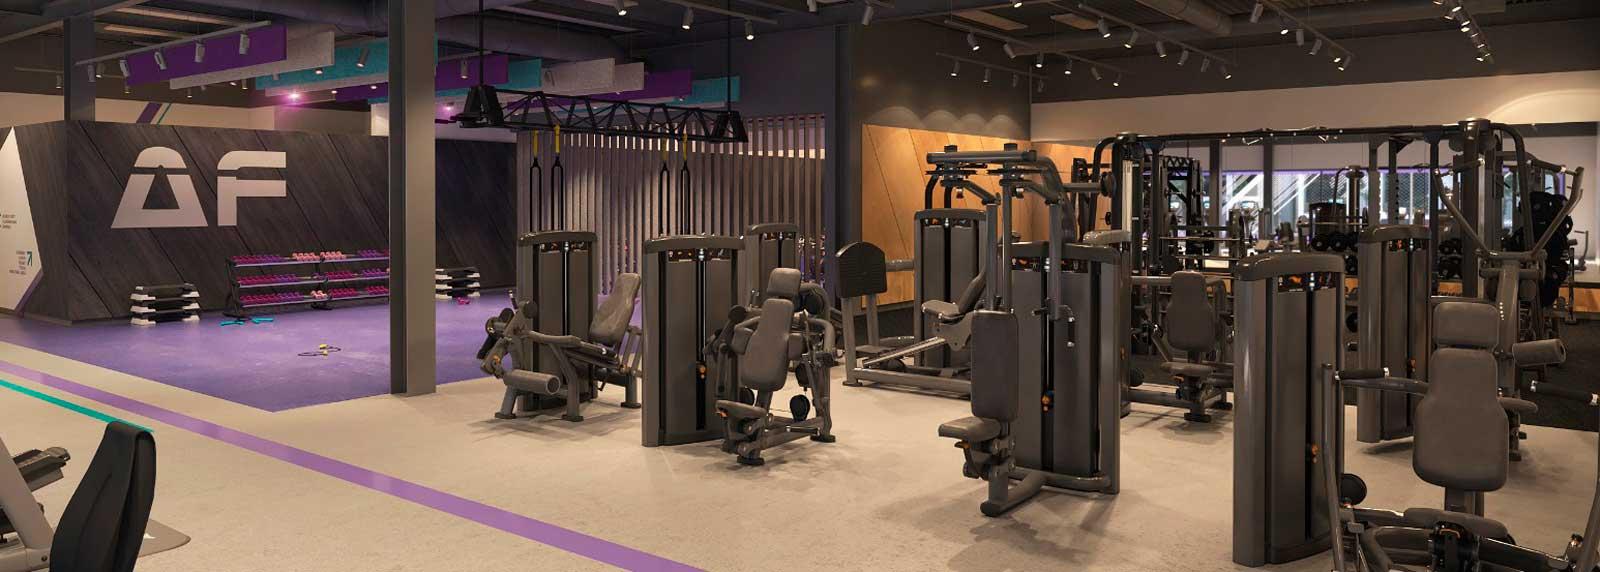 Anytime Fitness busca locales para afrontar su expansión